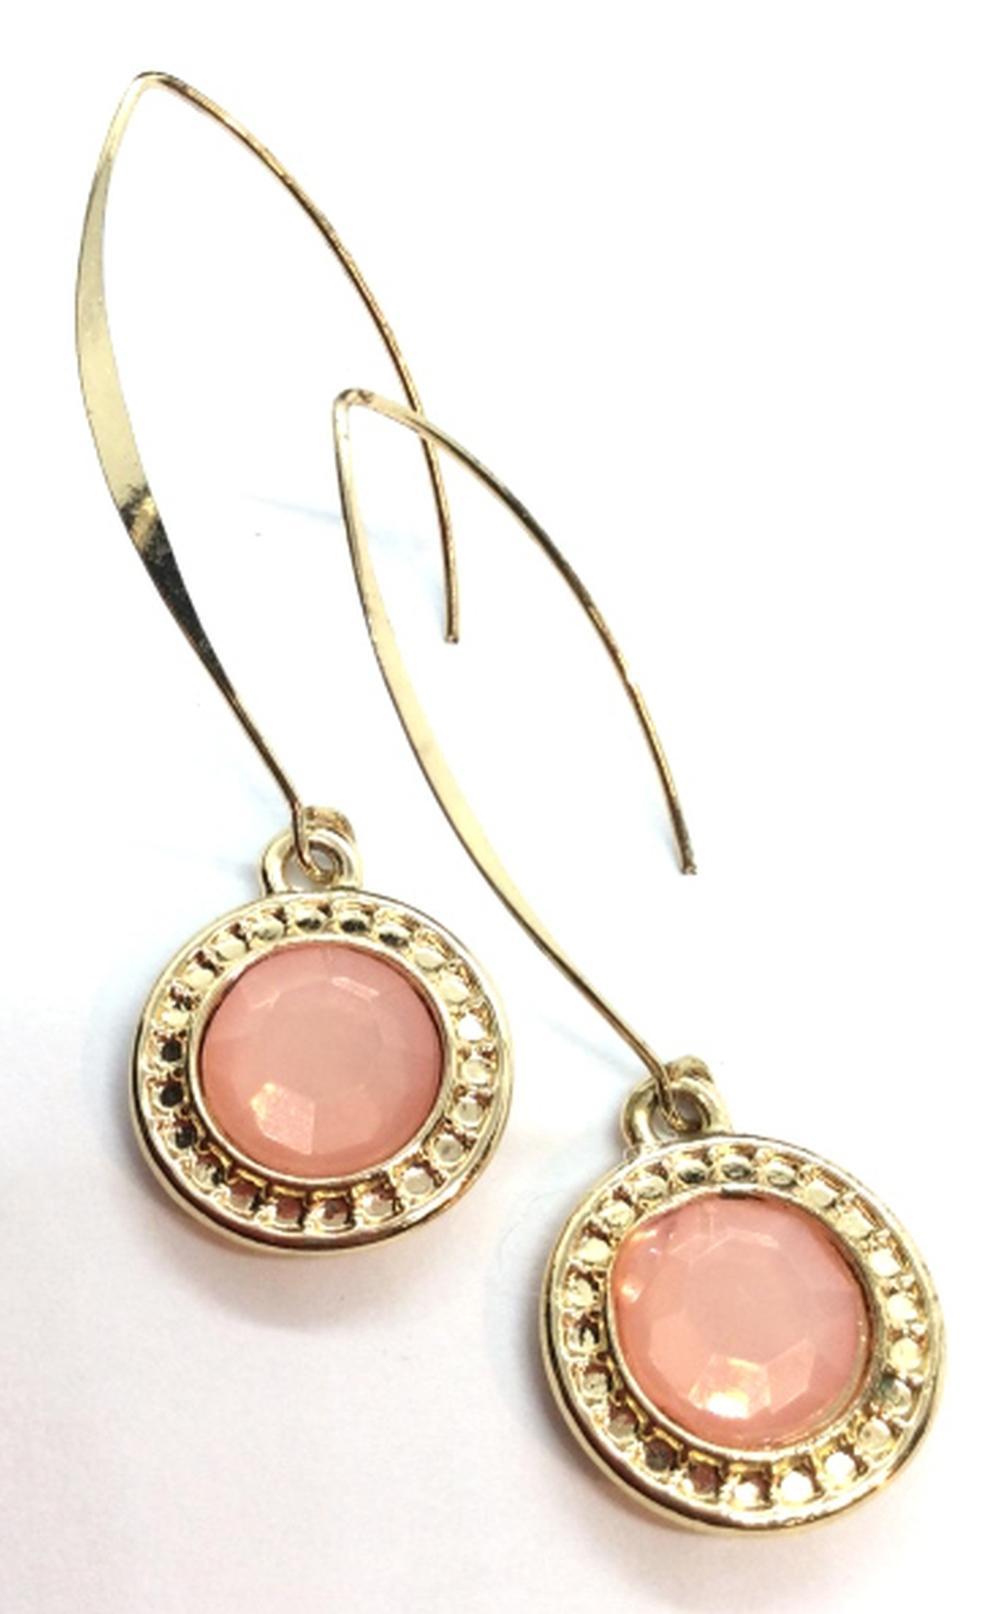 Pink Toned Rhinestone Earrings